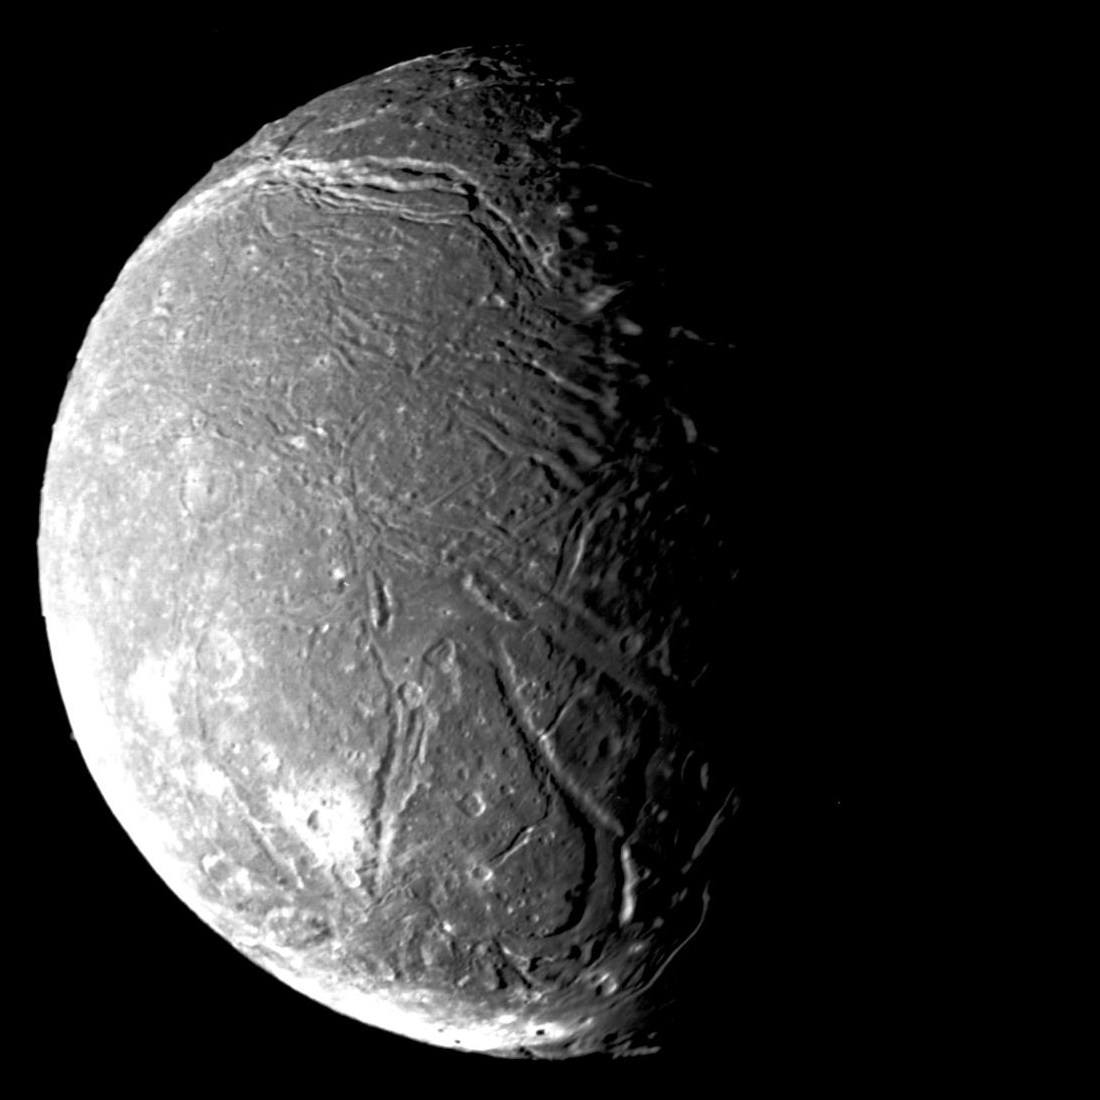 uranus moon cressida - photo #32